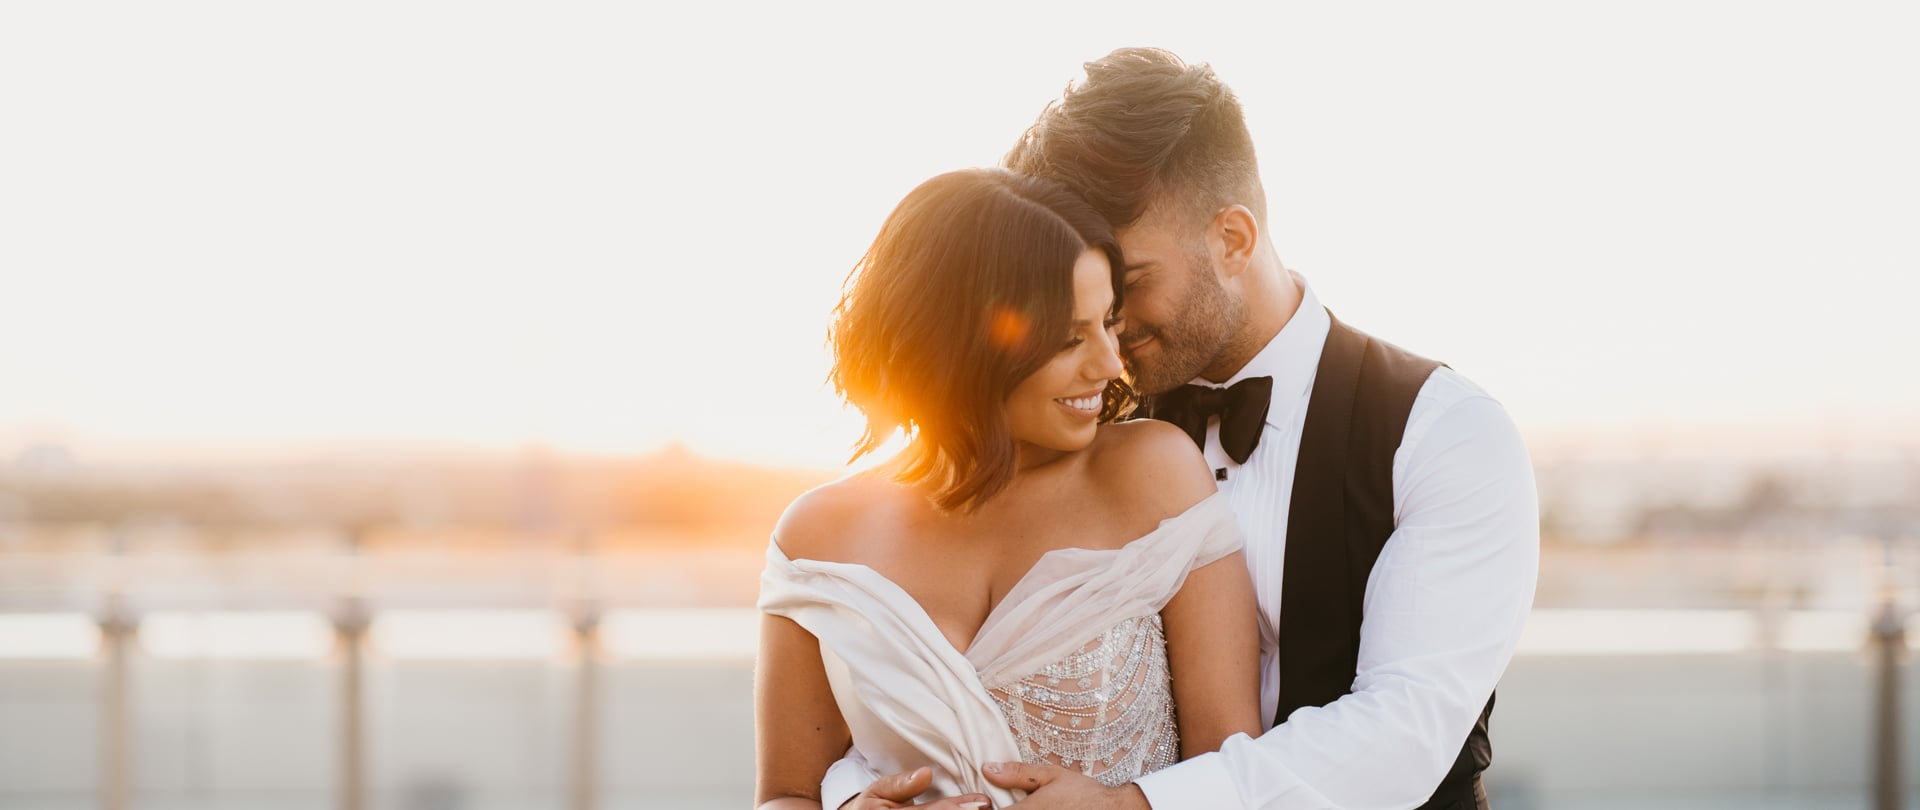 Alanna & George Wedding Video Filmed at Melbourne, Victoria